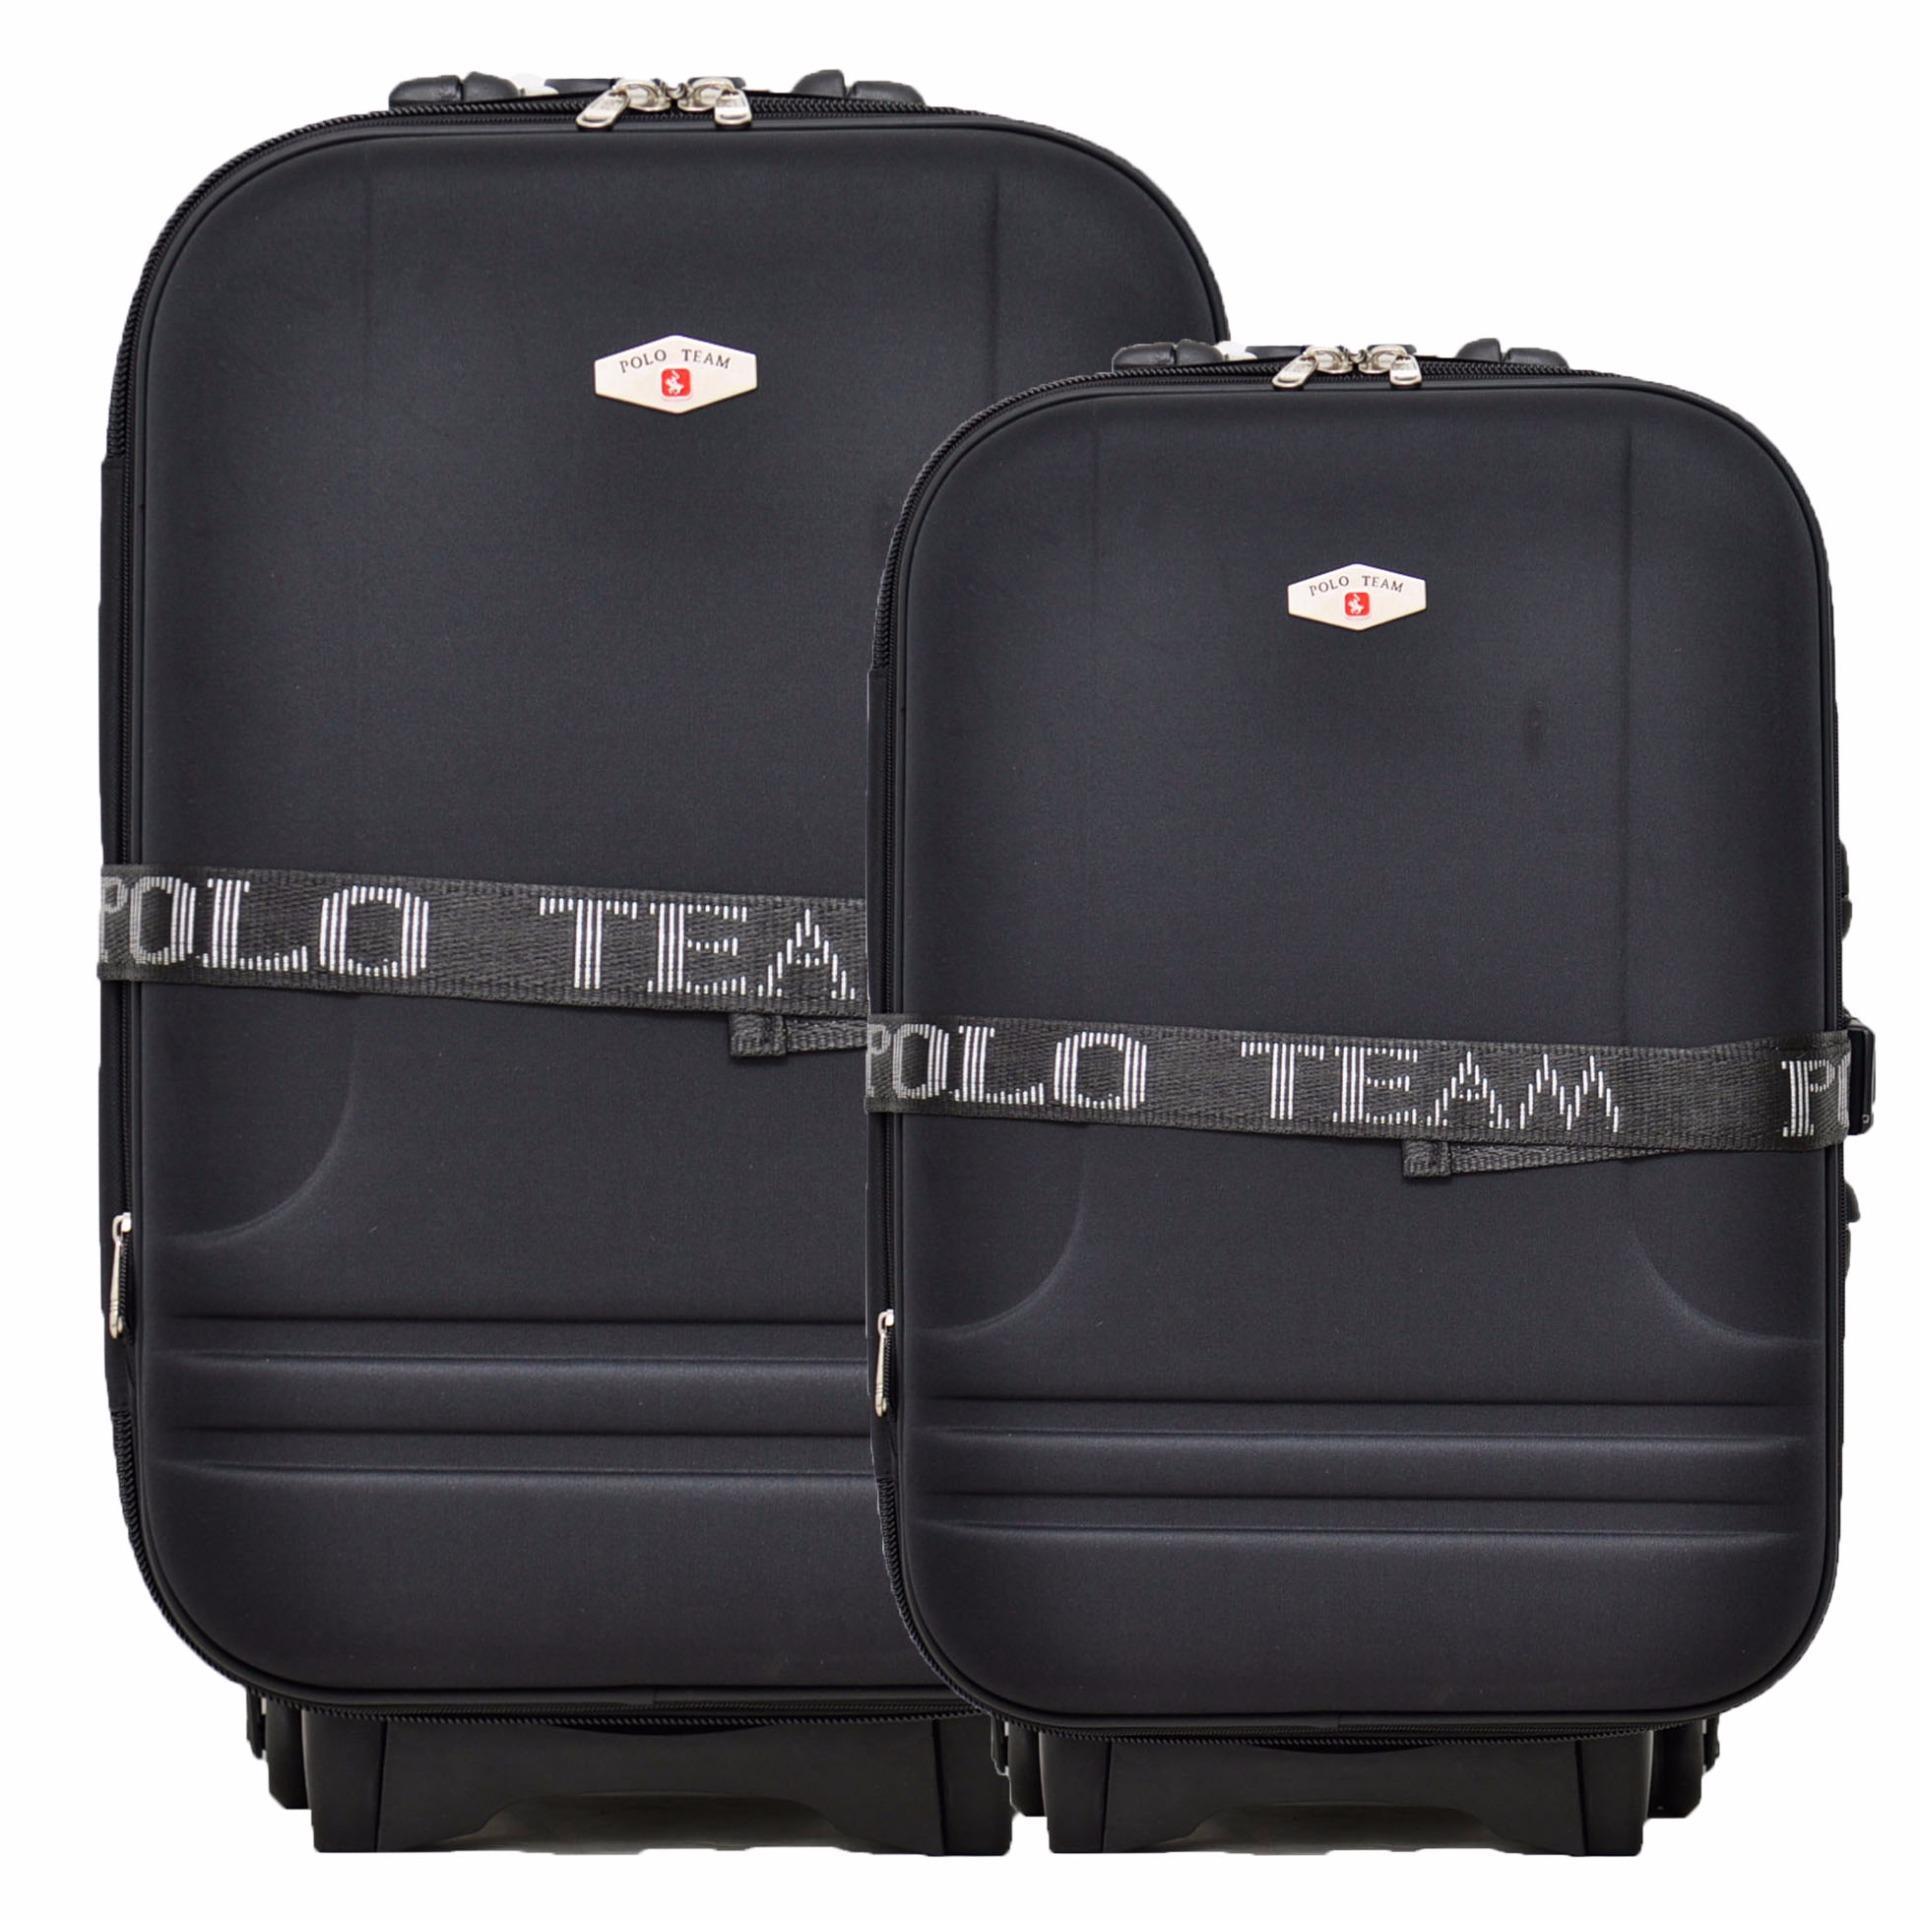 Harga Polo Team Tas Koper Expander 2 Roda Set Size 24 20 Inch 931 Hitam Origin